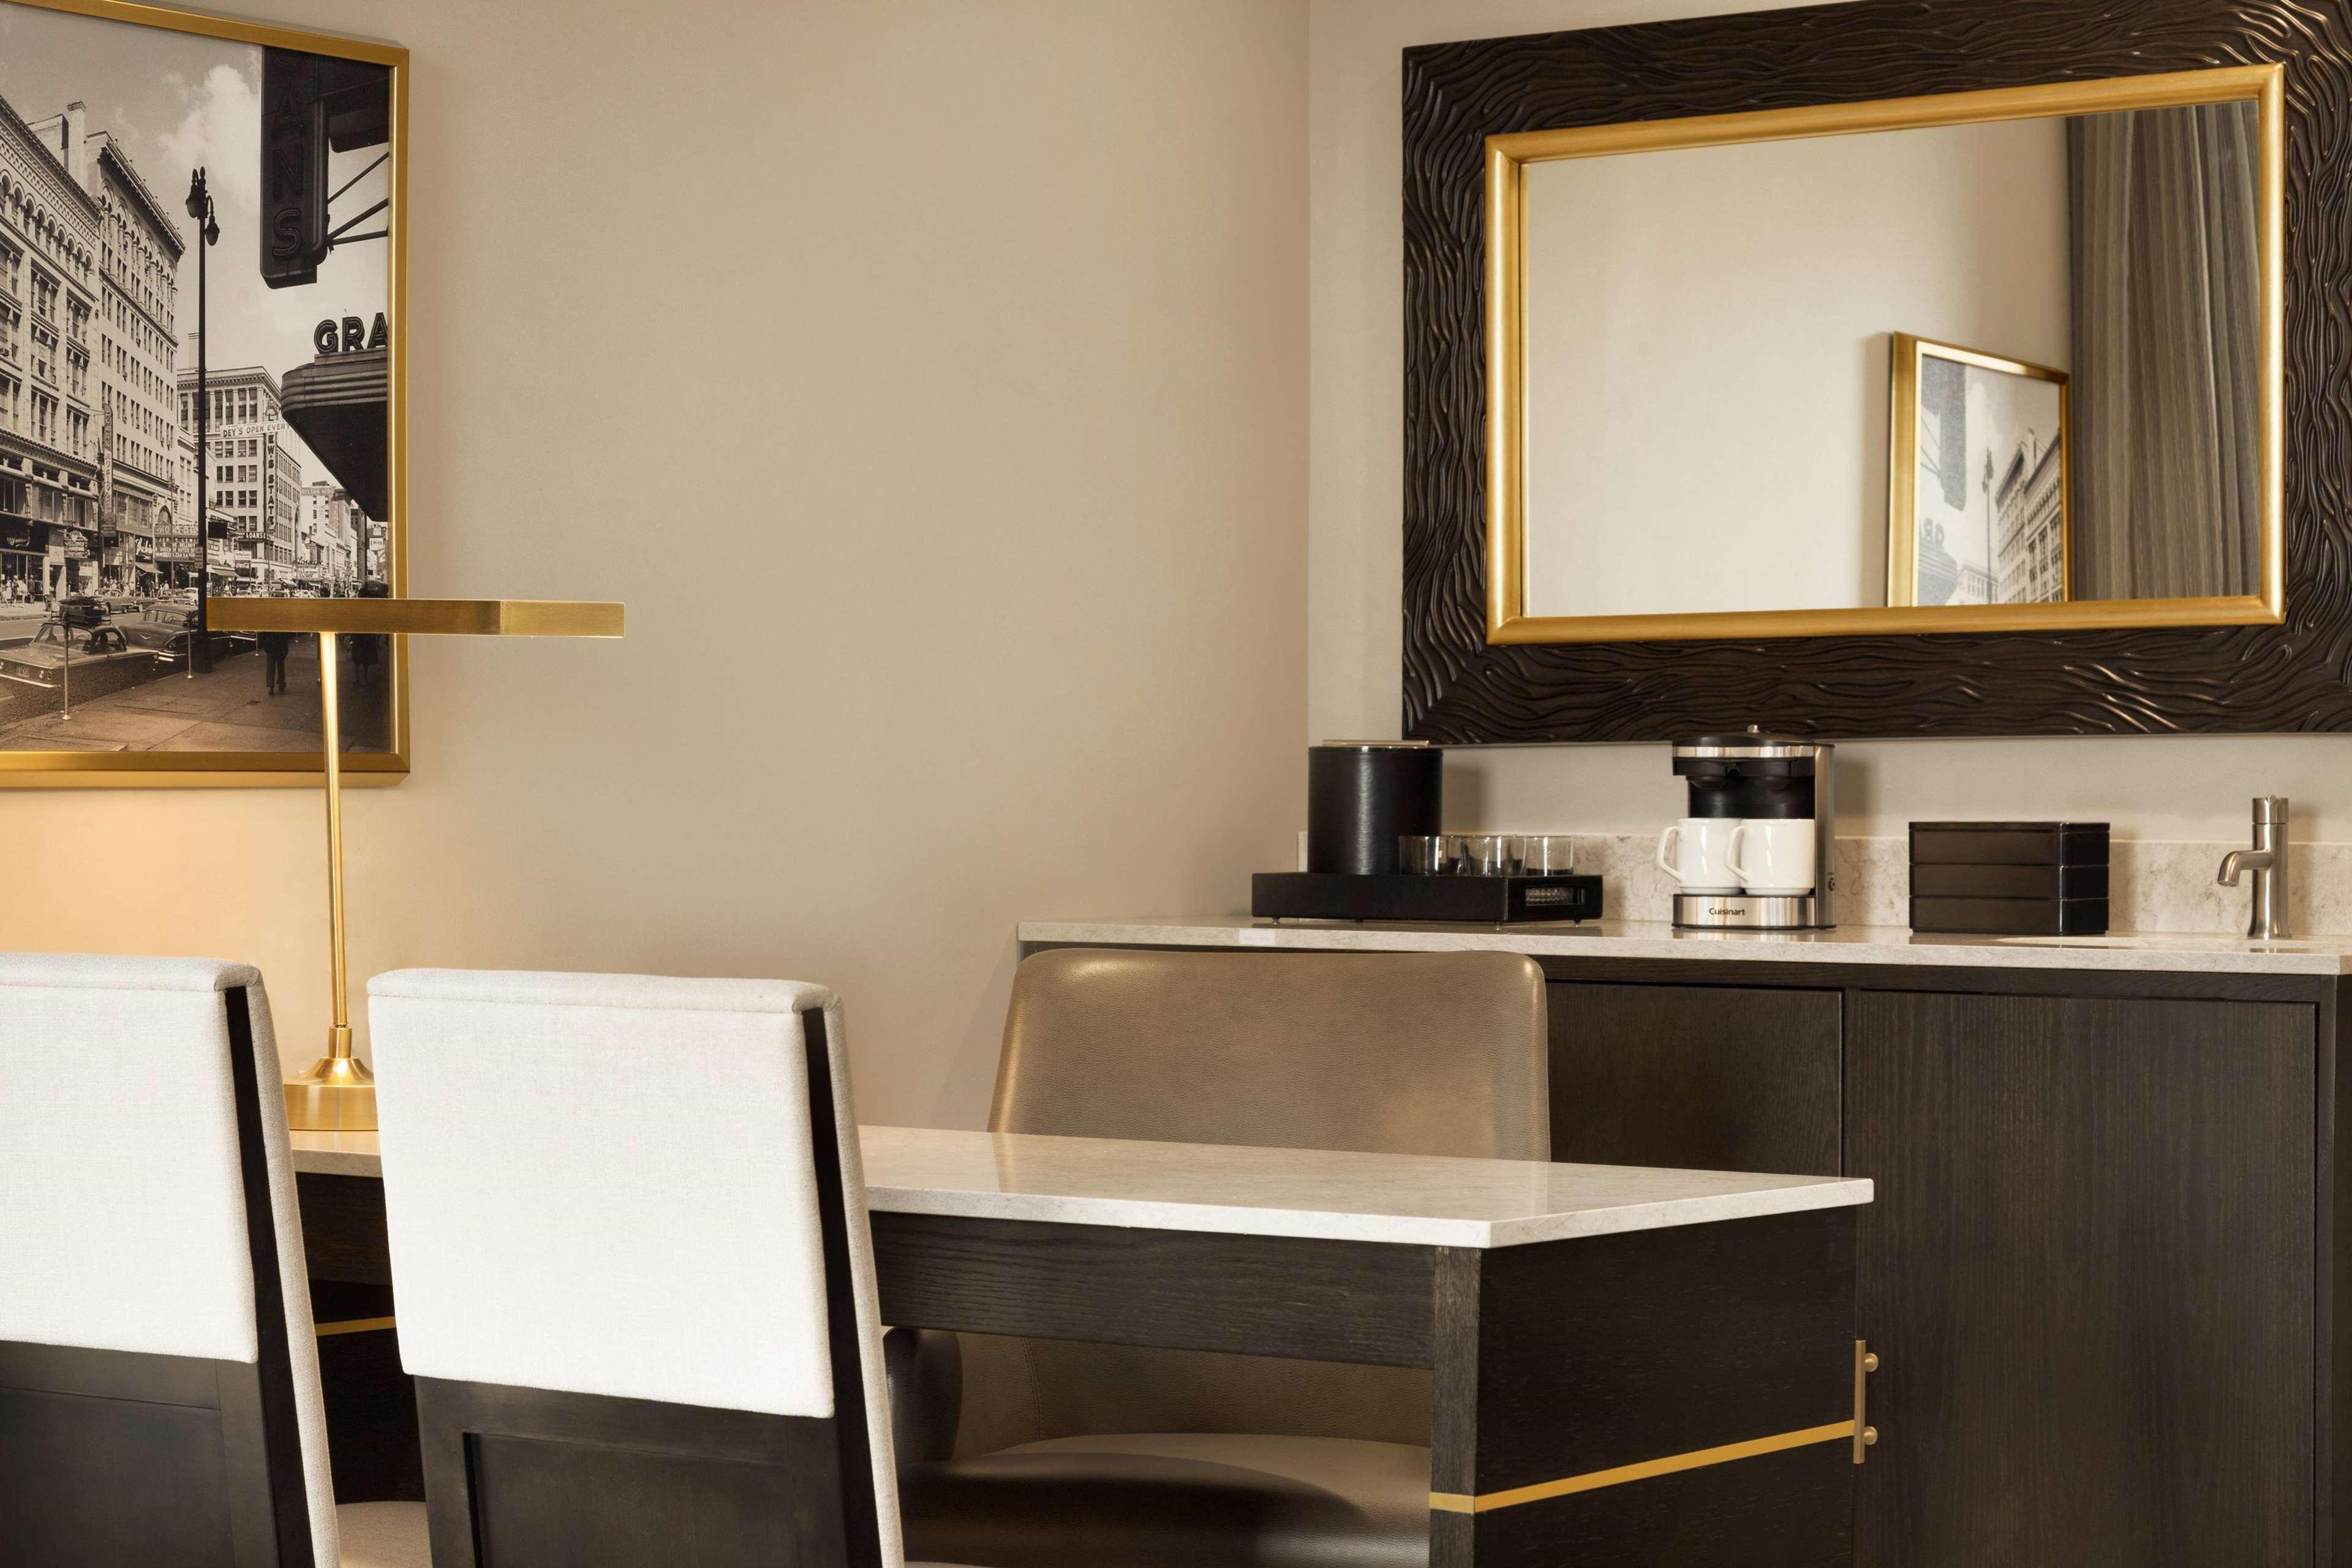 Embassy Suites by Hilton Syracuse Destiny USA image 7